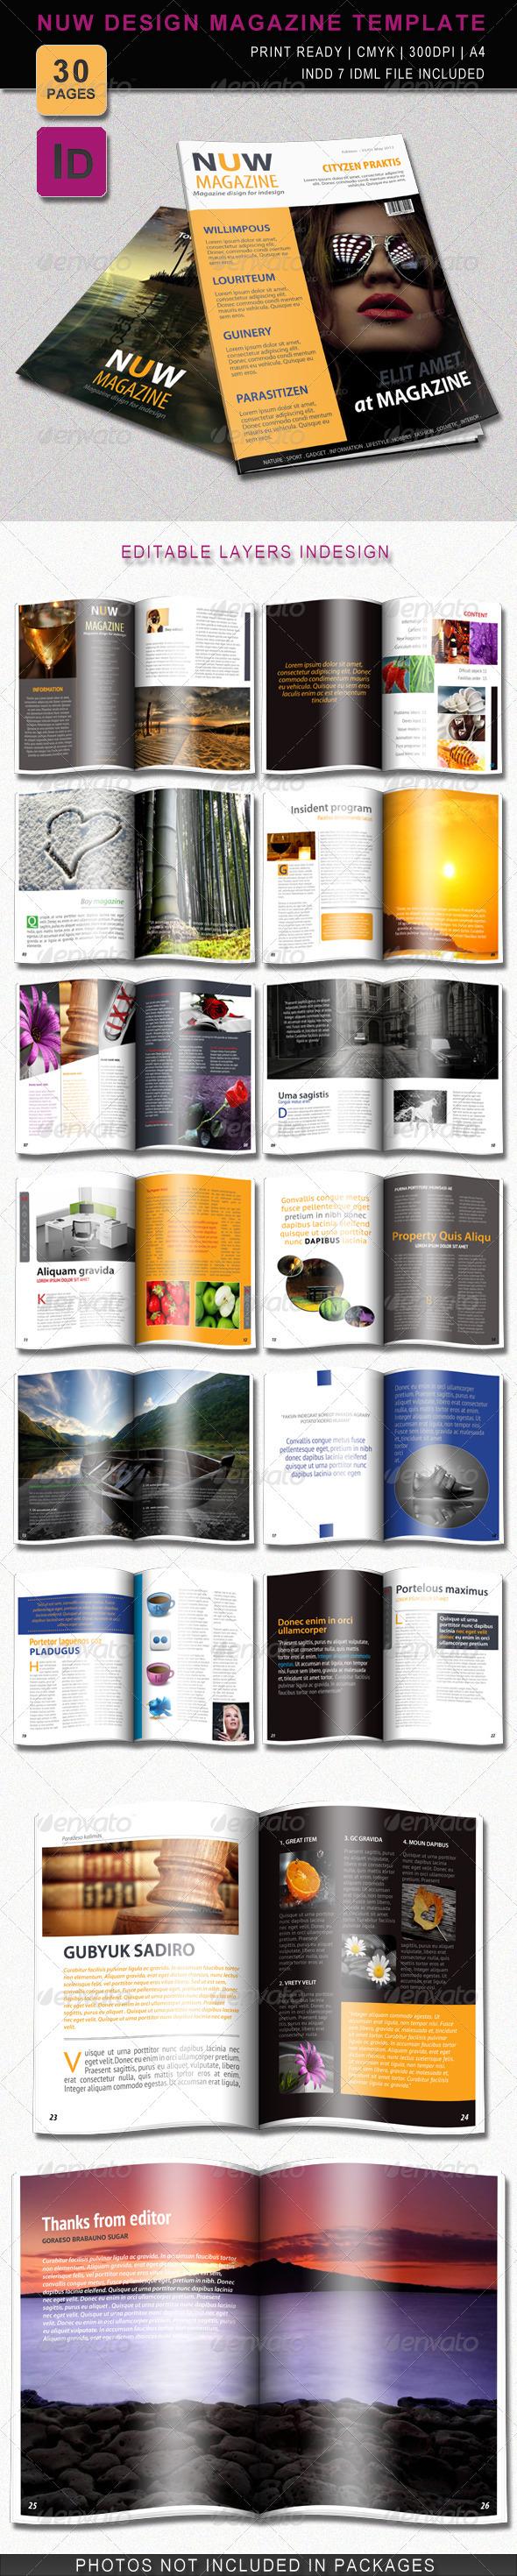 Nuw Design Magazine Template - Magazines Print Templates